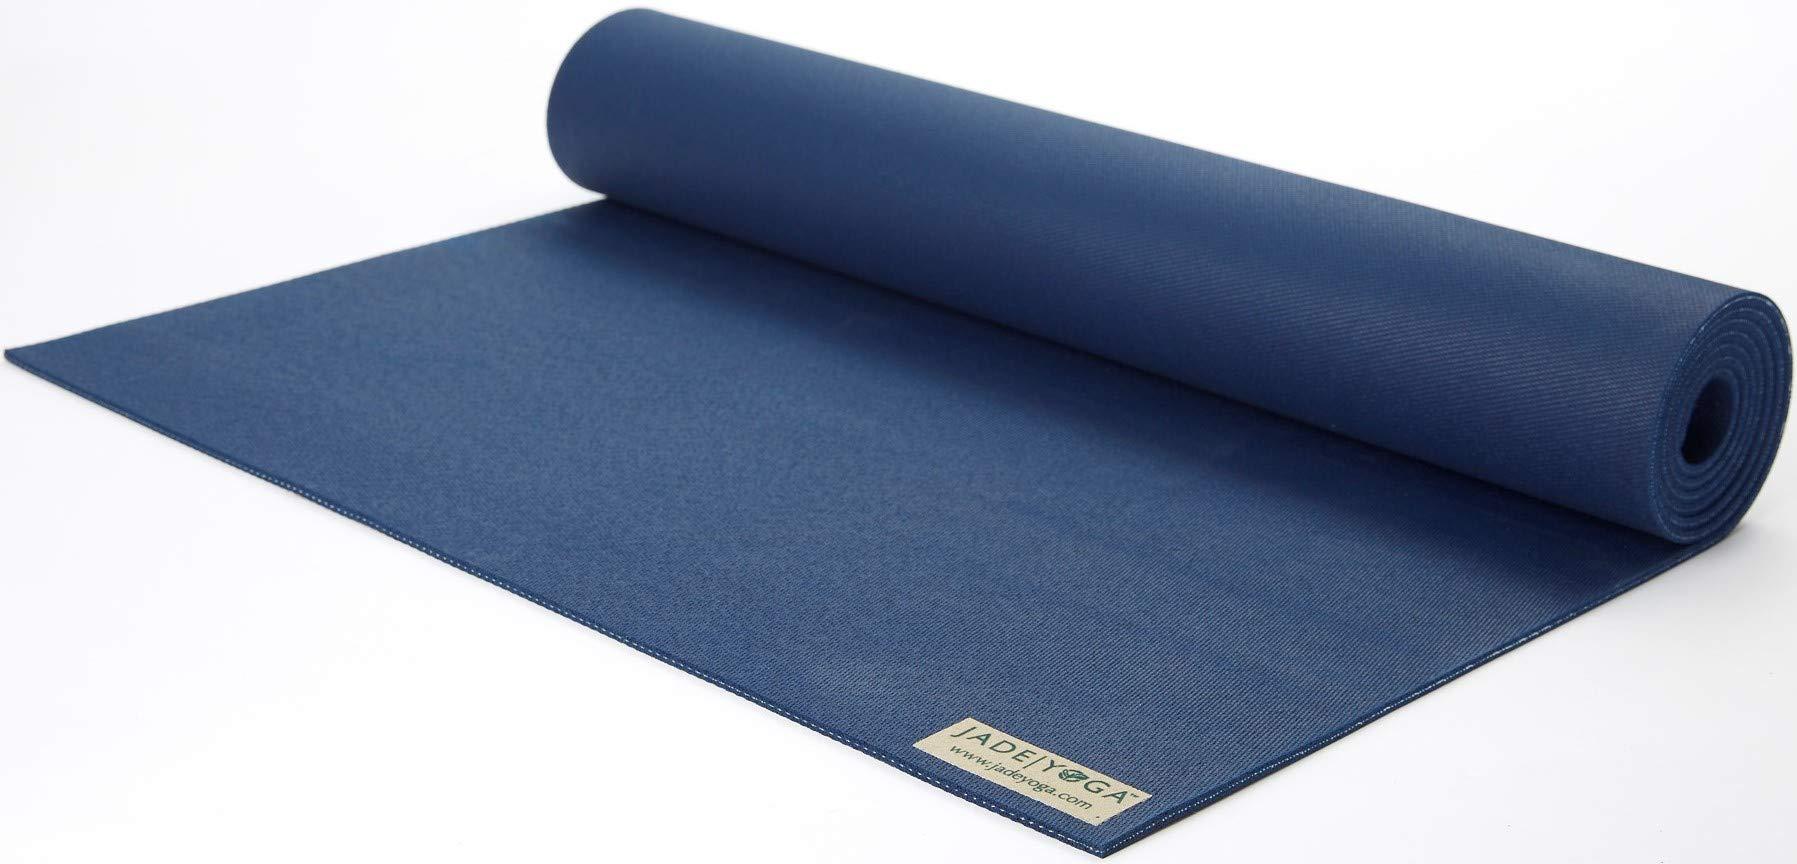 Jade 68-Inch by 1/8-Inch Travel Yoga Mat (Midnight Blue)